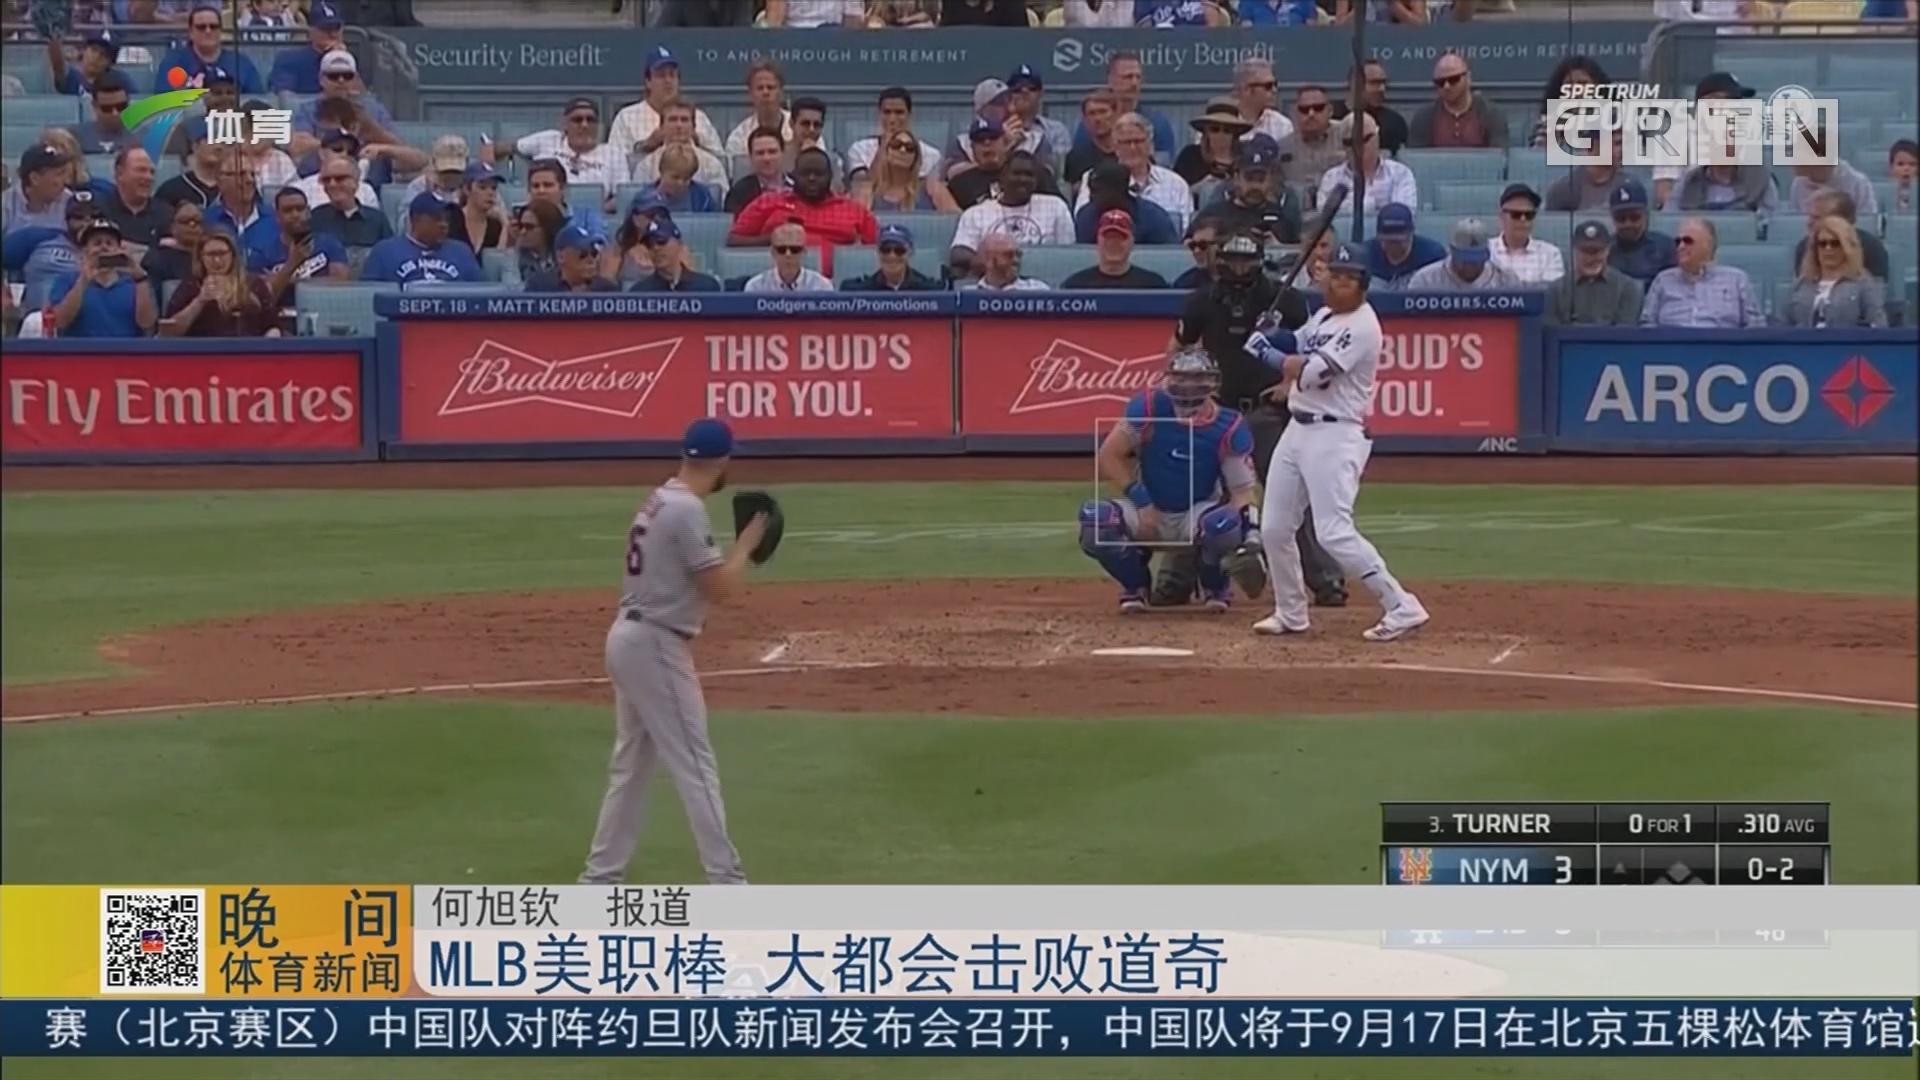 MLB美职棒 大都会击败道奇